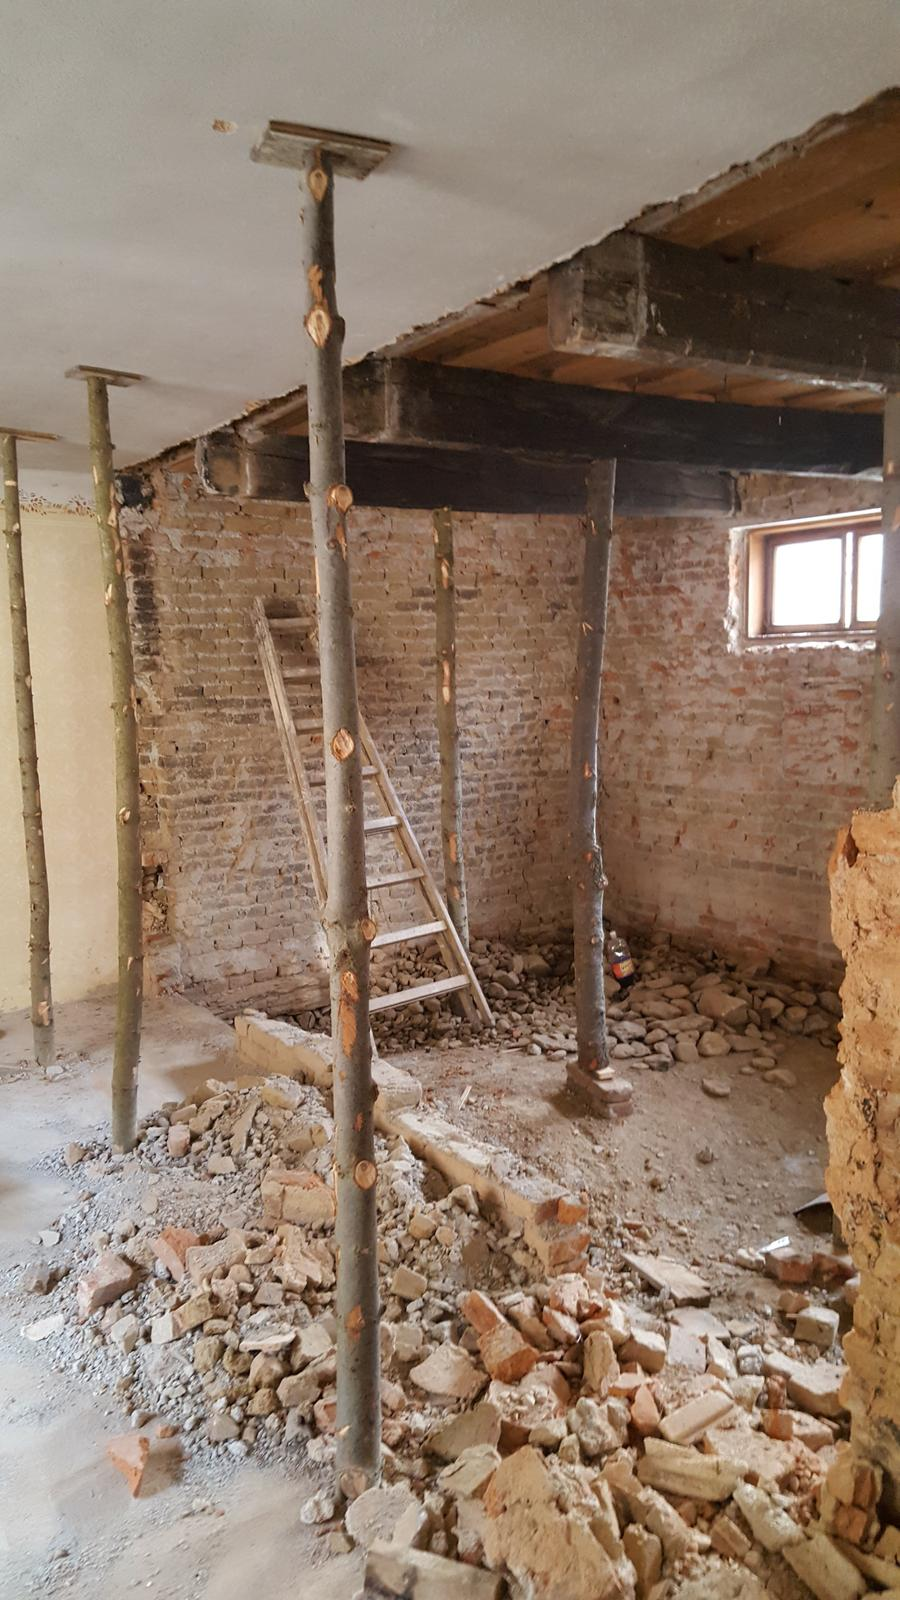 Prerabka domu v historickom centre - Dnes radikalne. zistili sme ze stena je tak kriva ze musi ist dole a postavit sa odznova